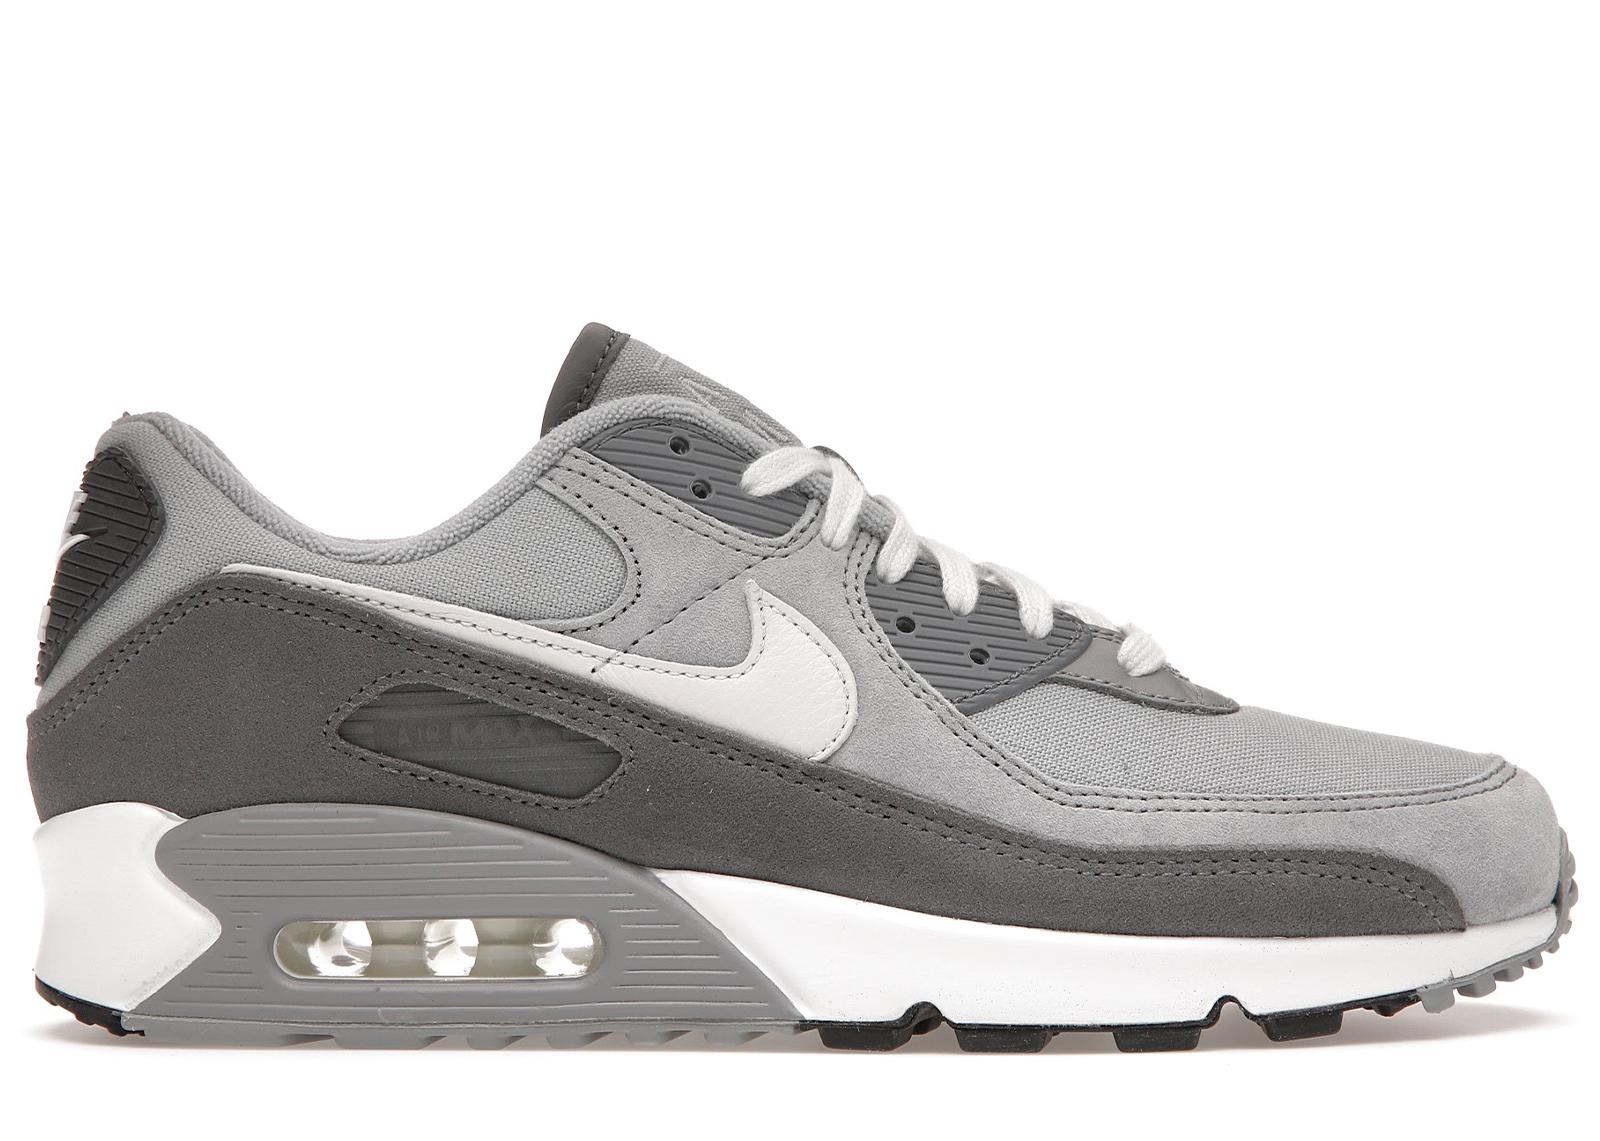 Nike Air Max 90 PRM Light Smoke Grey